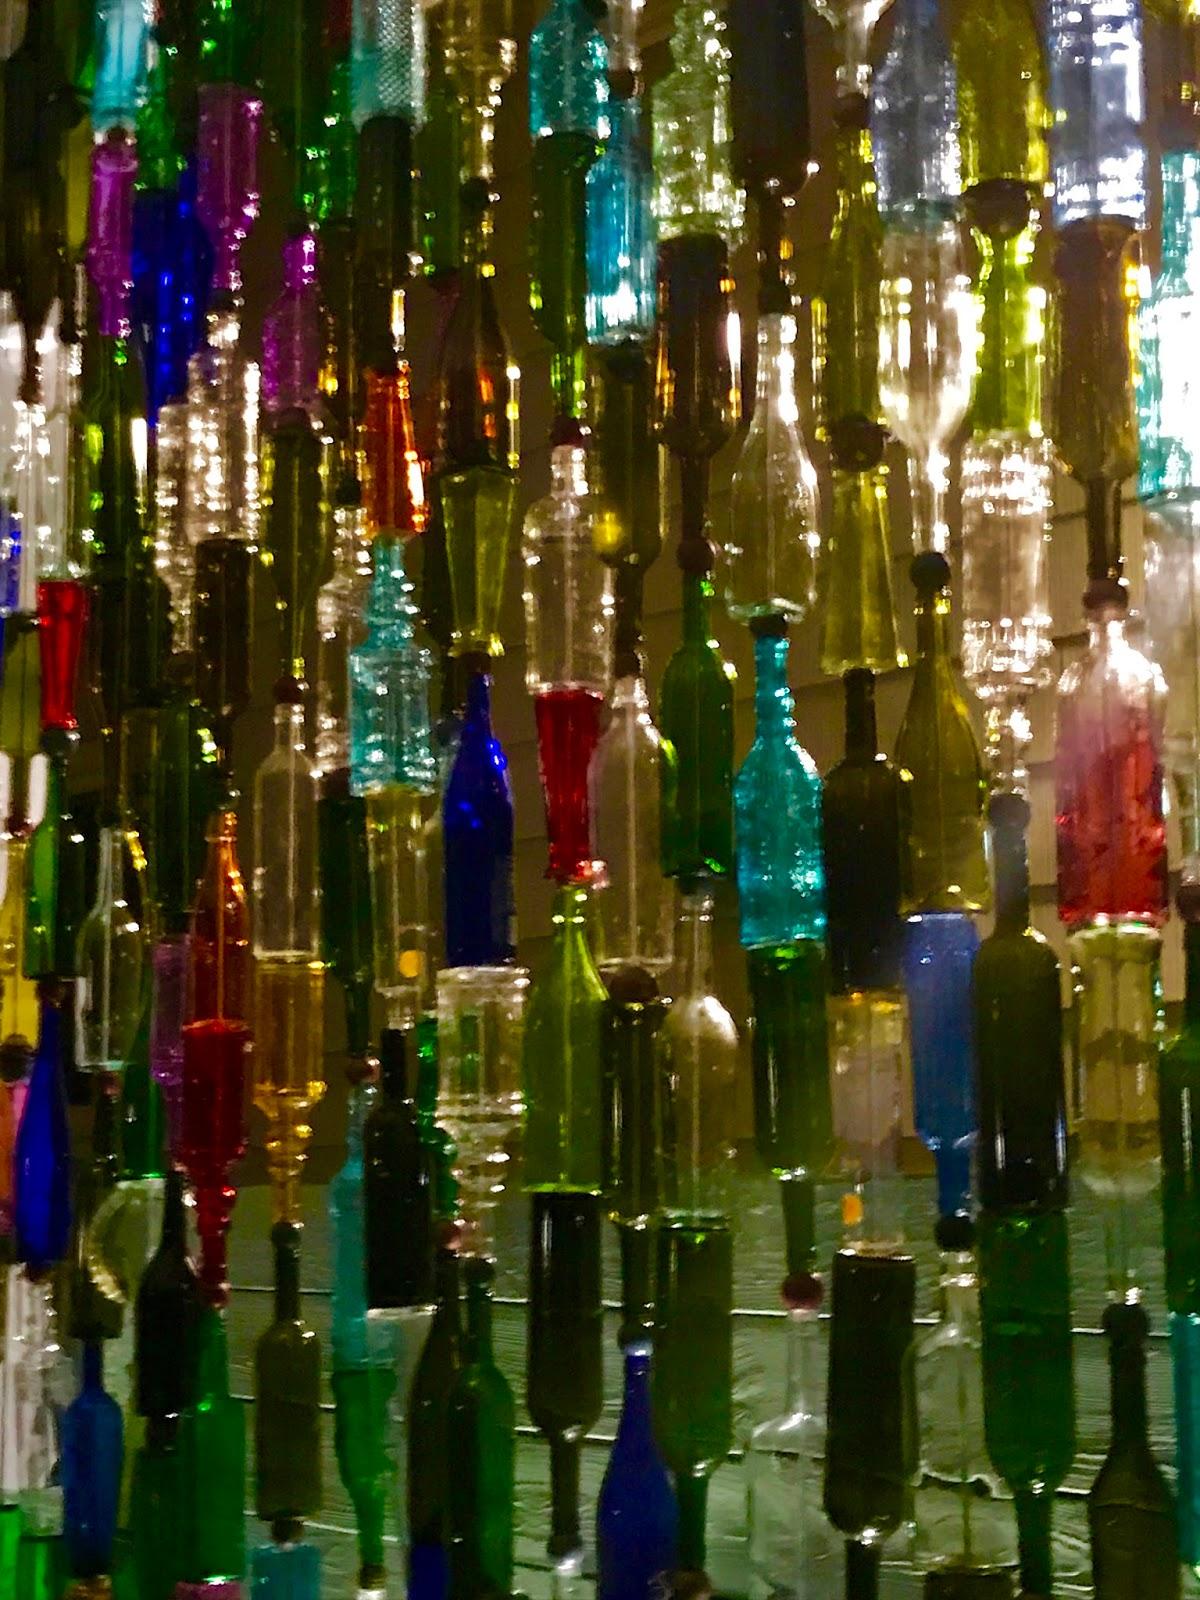 Garden art - a brilliant wine bottle wall